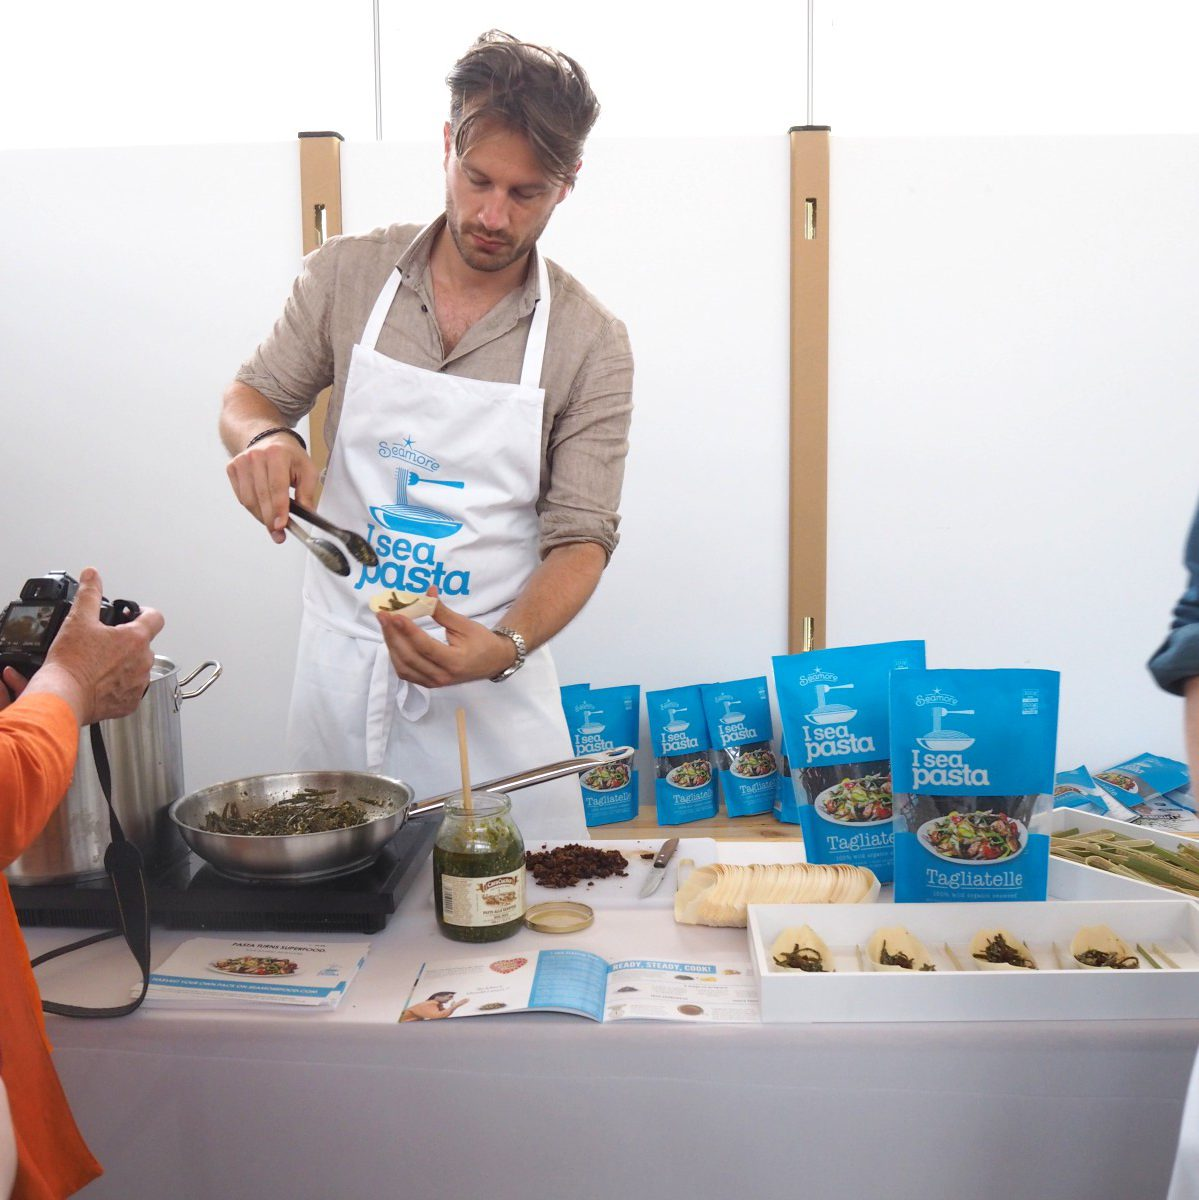 next organic messe berlin alge algenpasta pasta i sea pasta